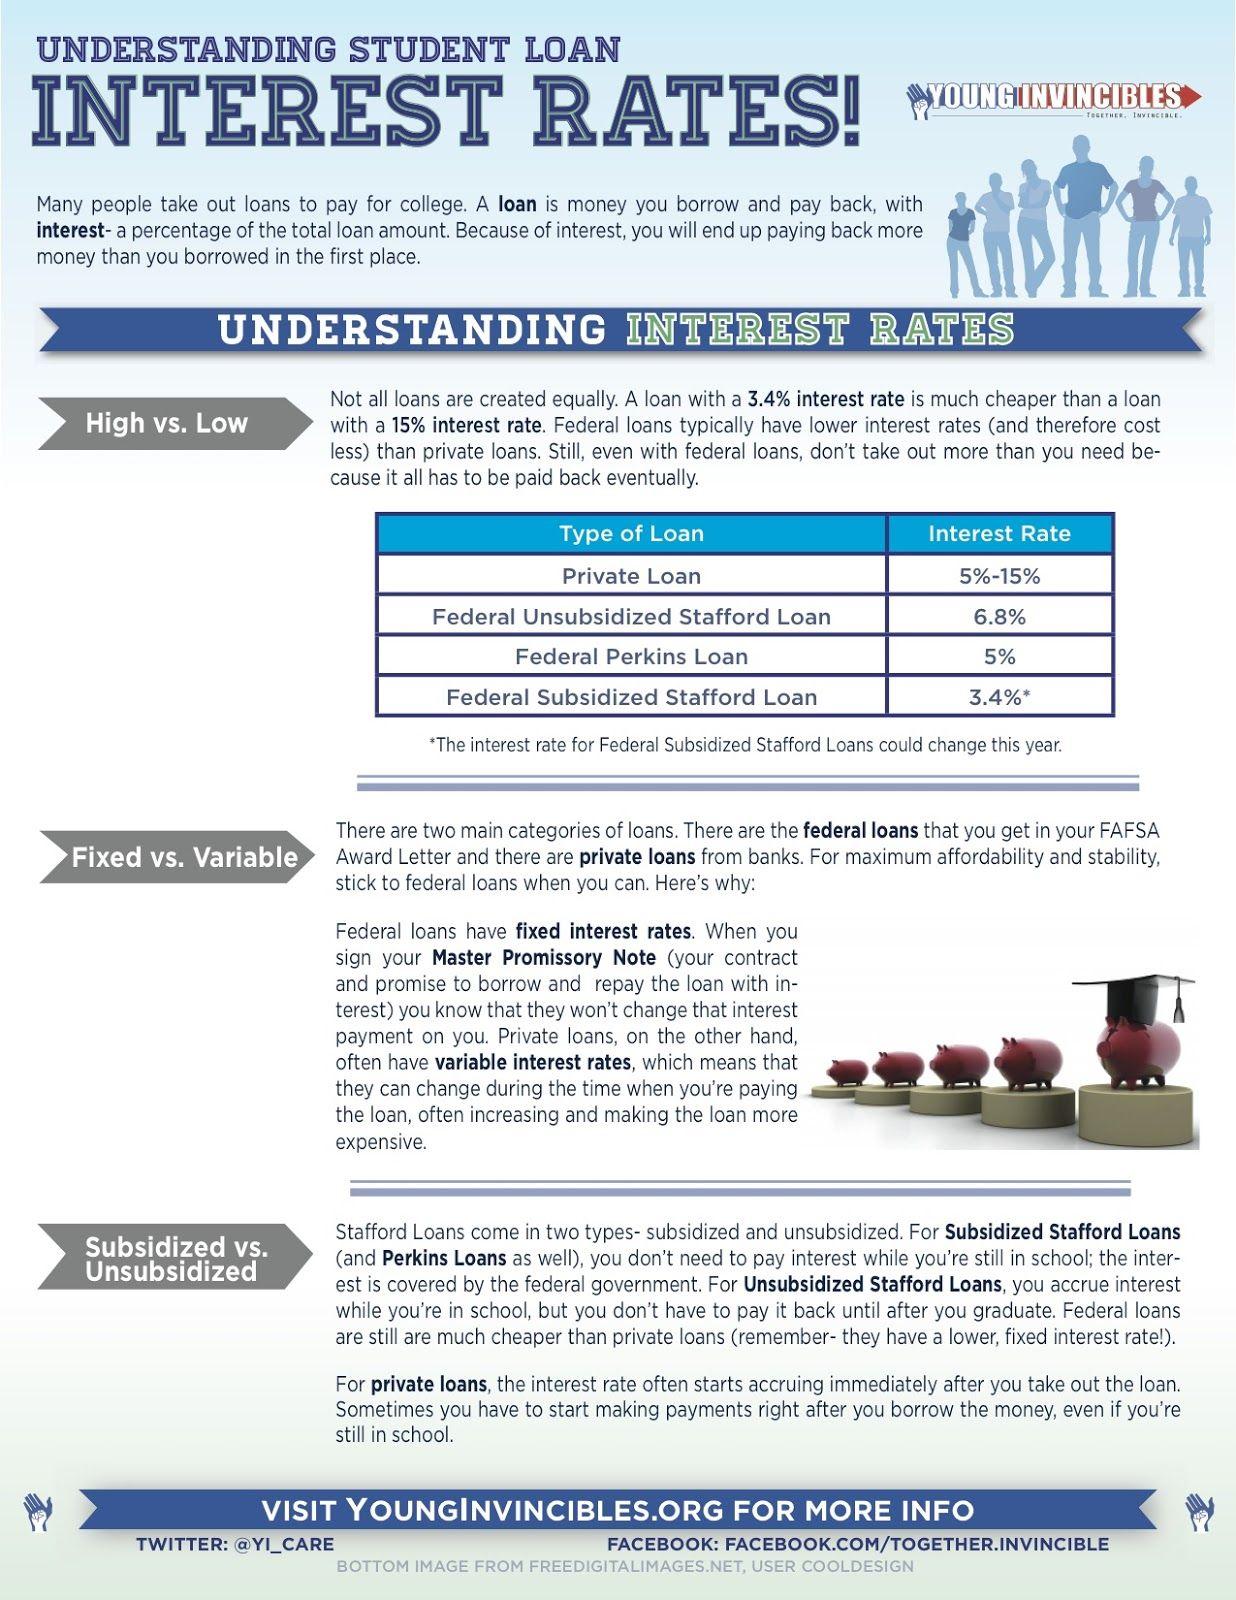 Understanding Student Loan Interest Rates Infographic Via